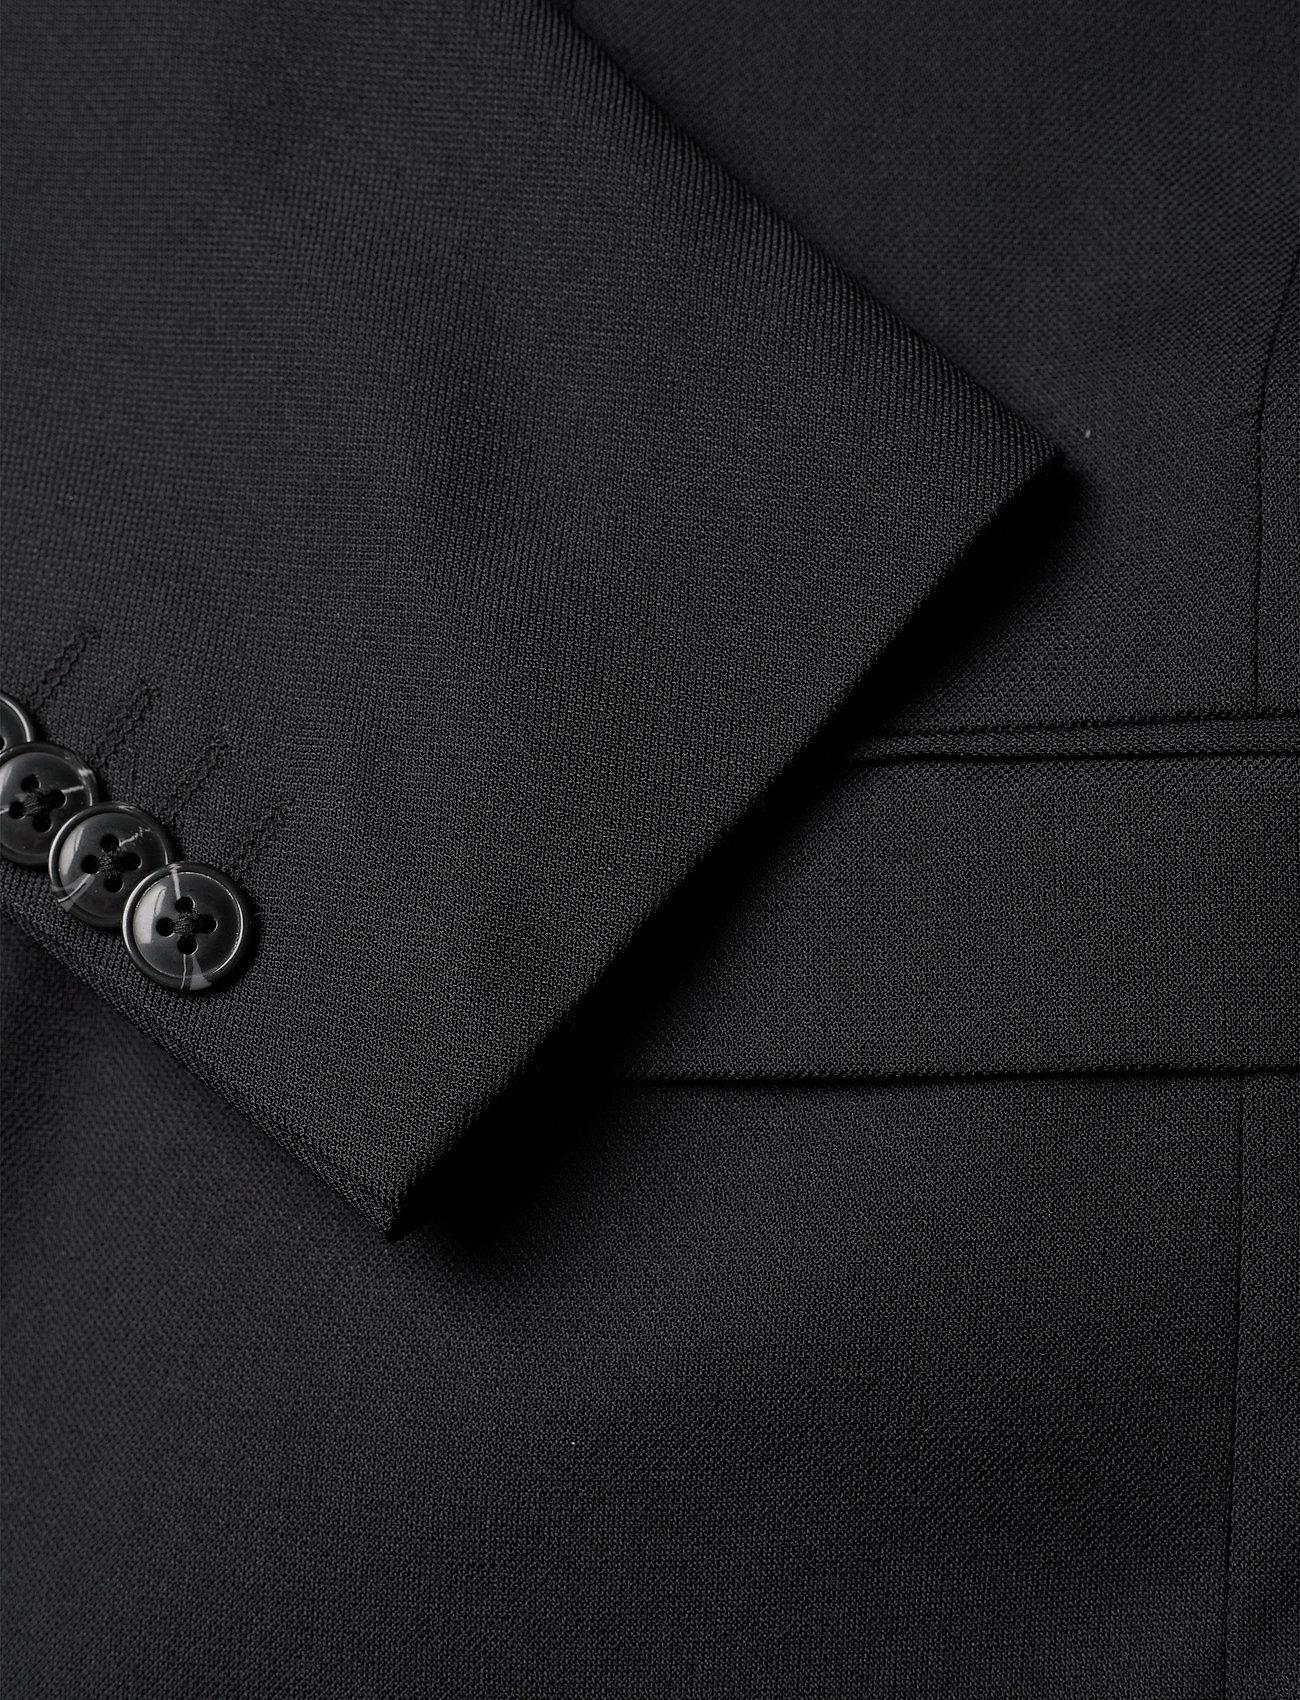 Jack & Jones JPRSOLARIS SUIT - Dresser & blazere BLACK - Menn Klær